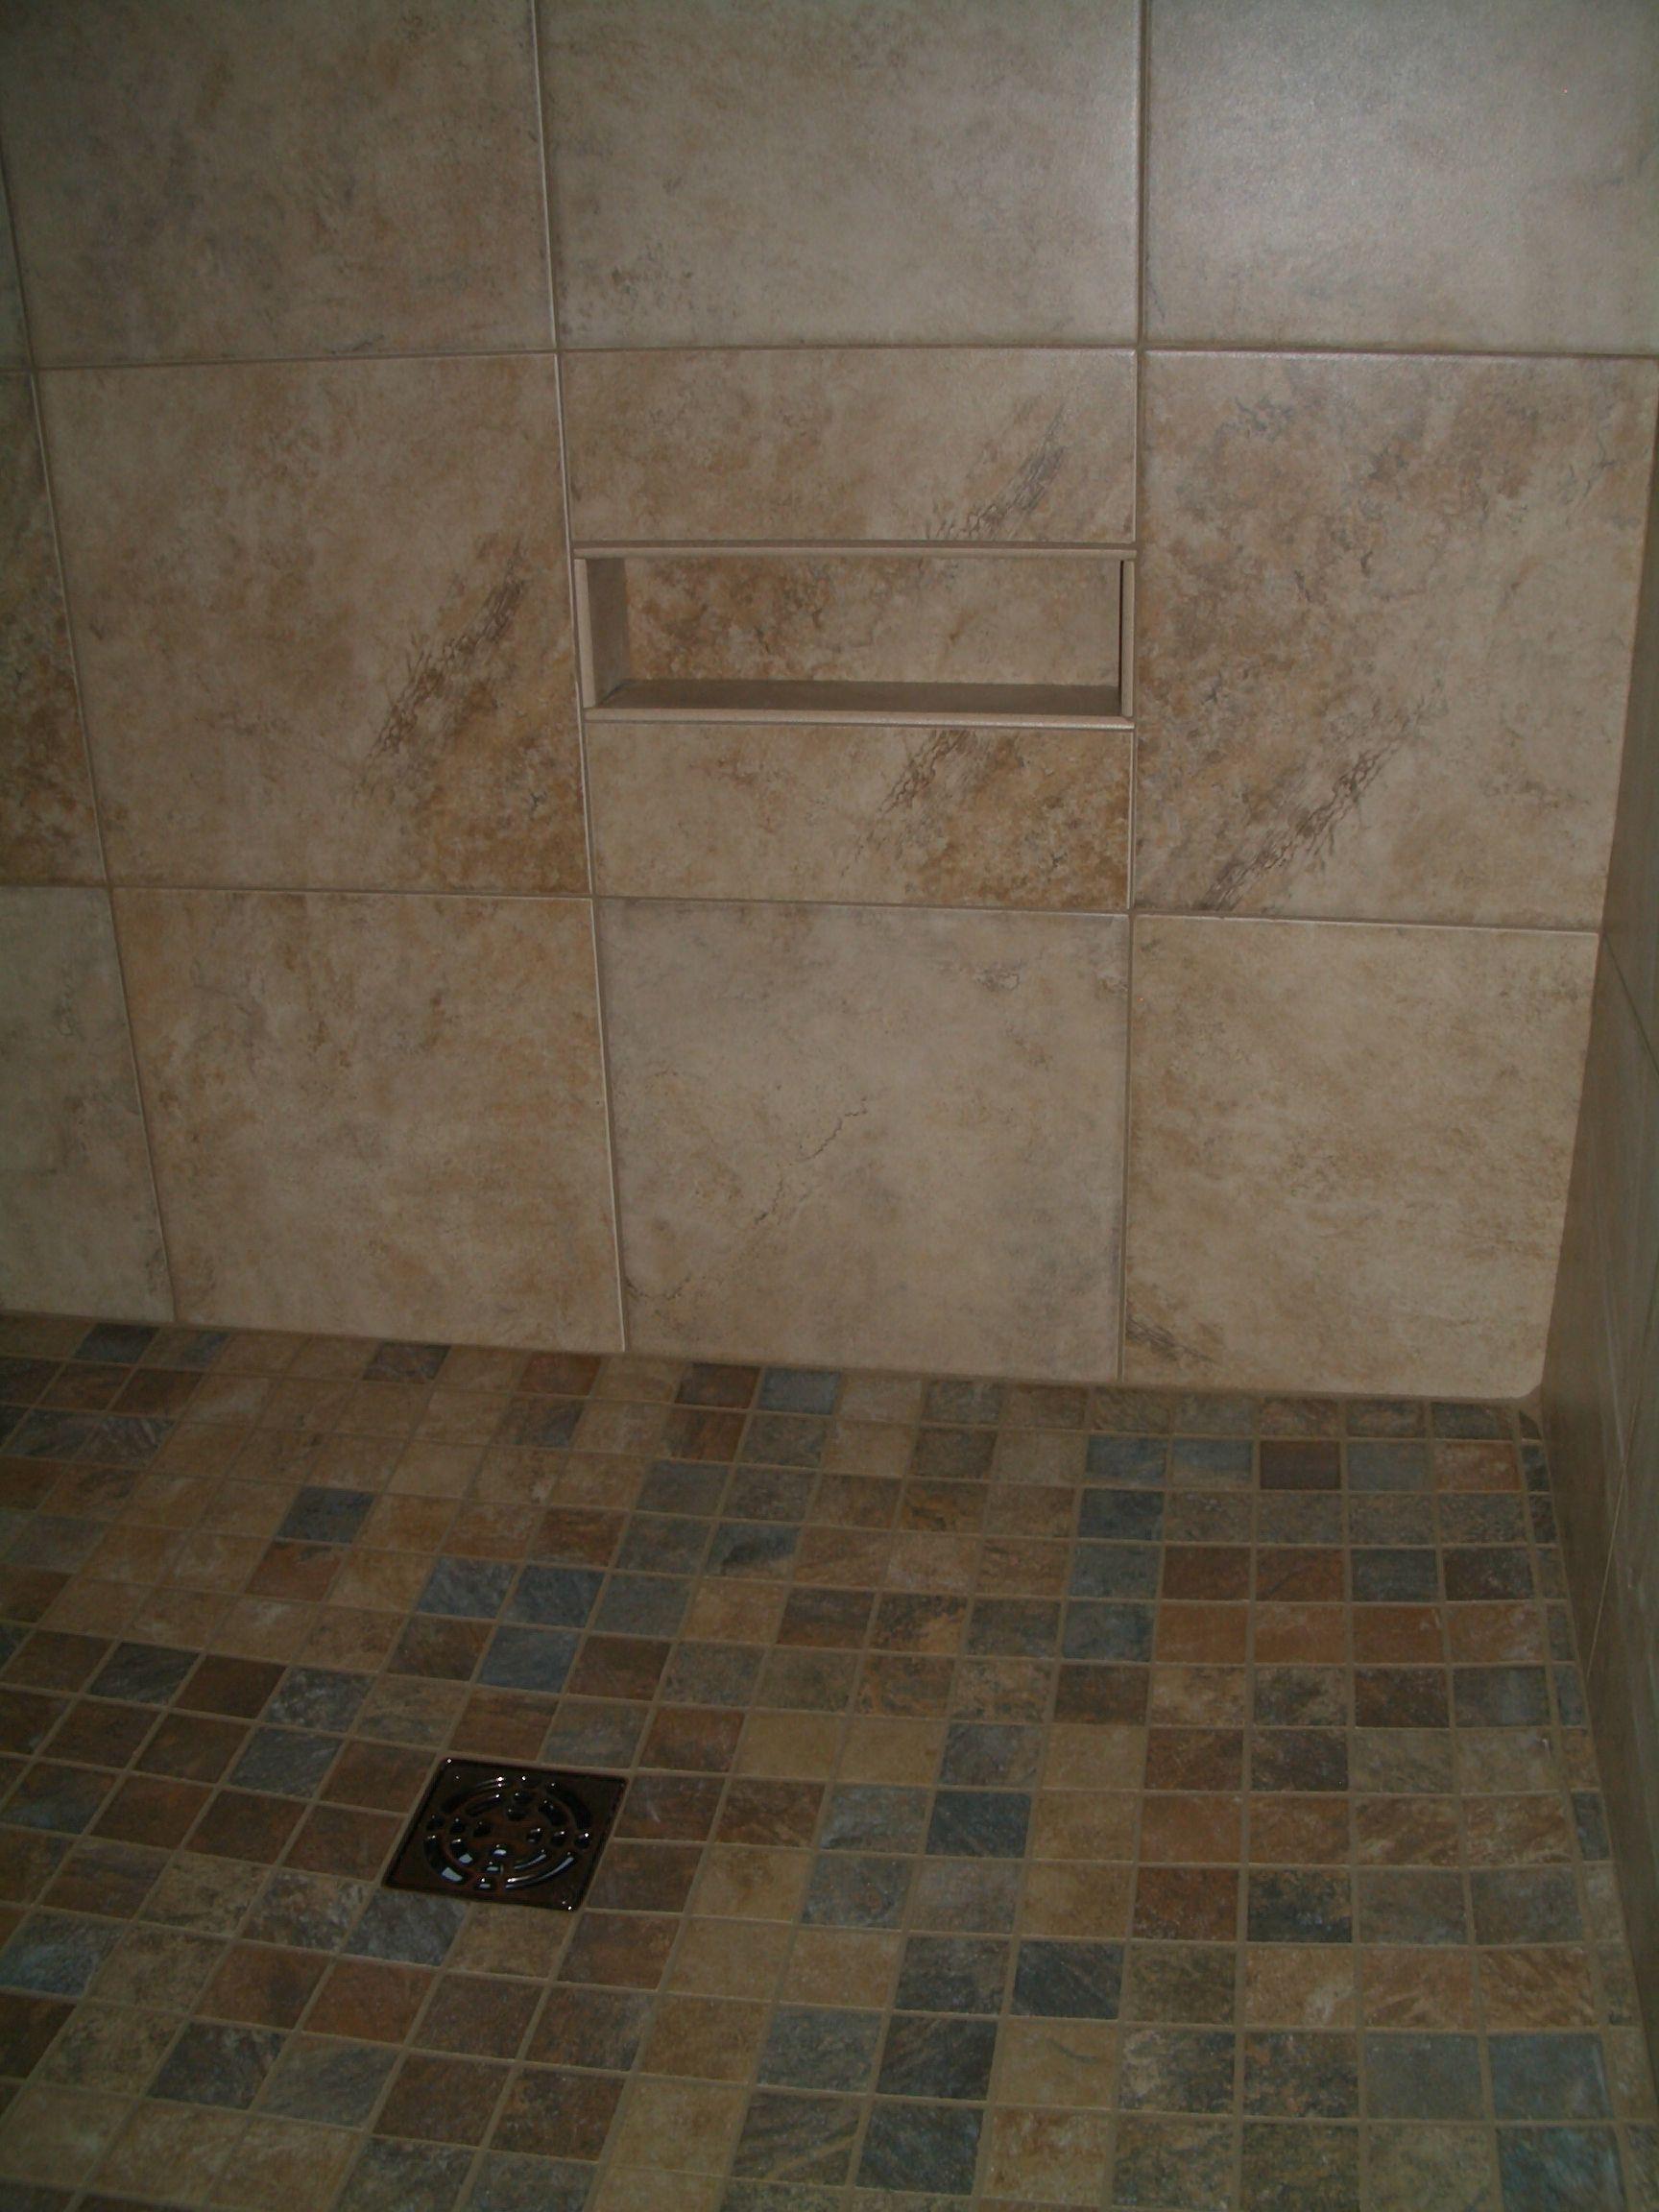 Shower Upgrade Options With Images Shower Tile Bathroom Niche